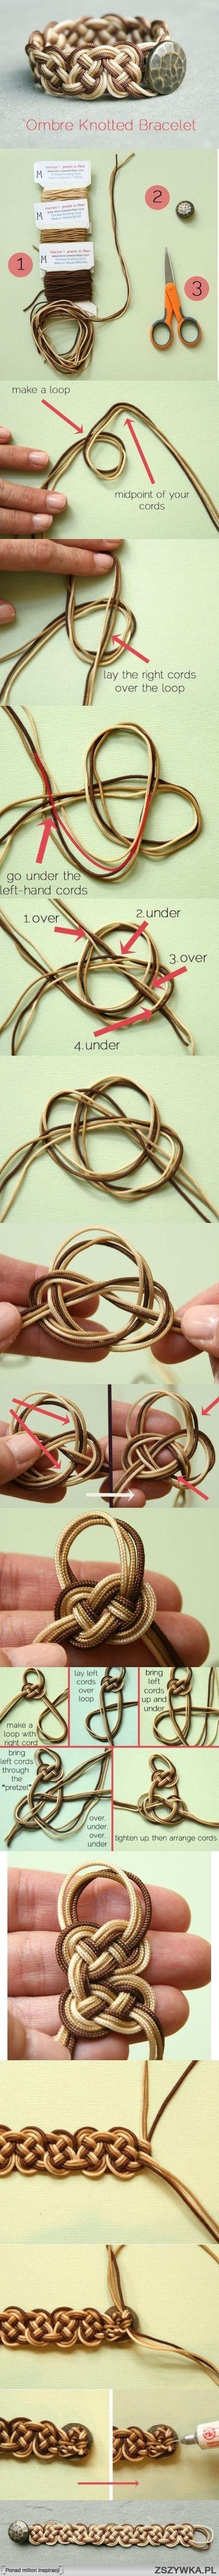 DIY OMBRE KNOTTED BRACELET (http://remarkablydomestic.com/2012/10/12/diy-ombre-knotted-bracelet/)